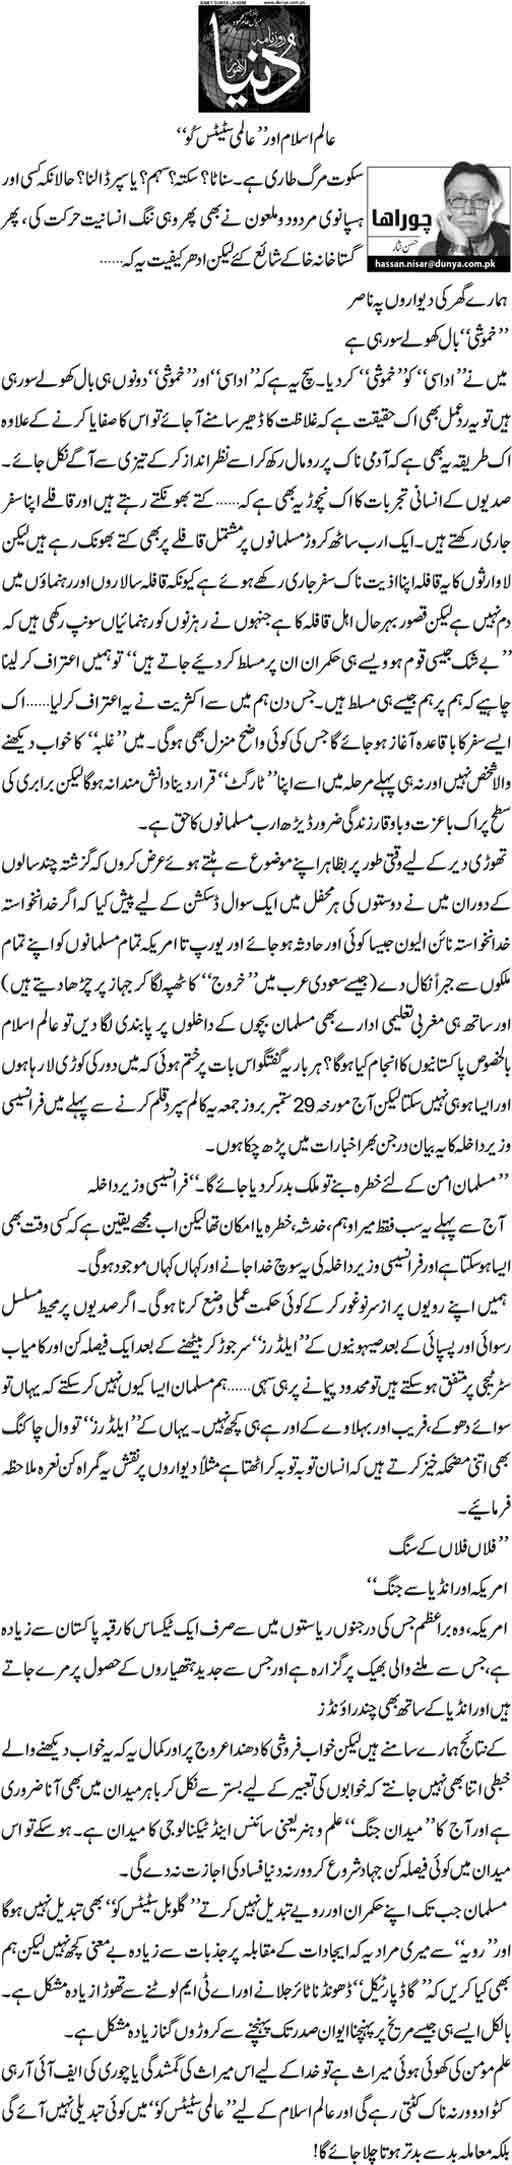 "Aalam e Islam aur ""aalmi status co"" - Hassan Nisar"